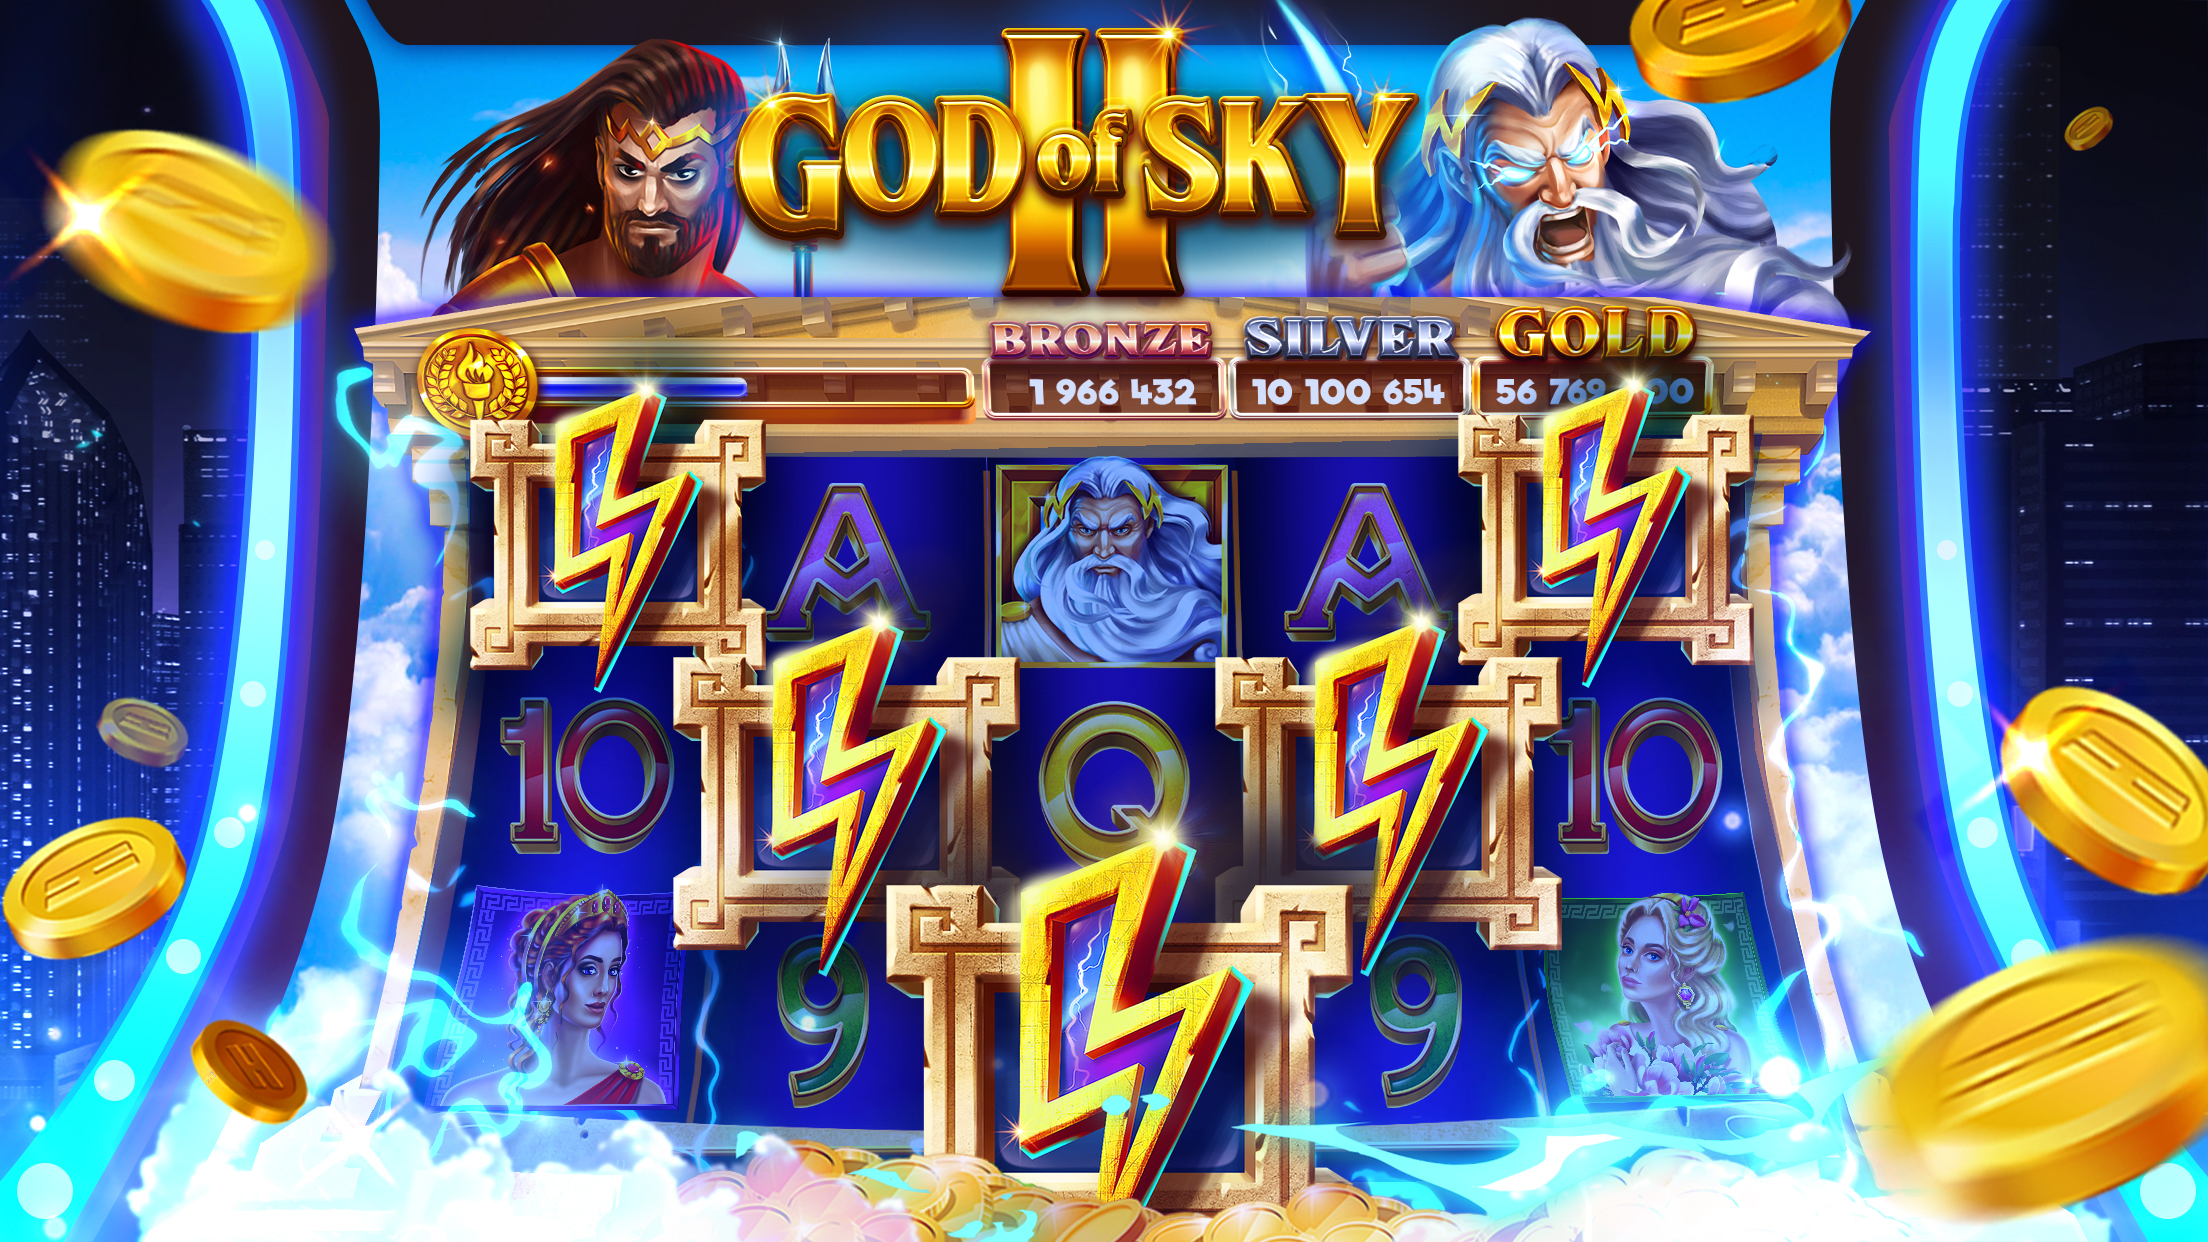 Huuuge Casino Slots Free Casino Slots Games Apk 6 4 3006 Download For Android Download Huuuge Casino Slots Free Casino Slots Games Apk Latest Version Apkfab Com